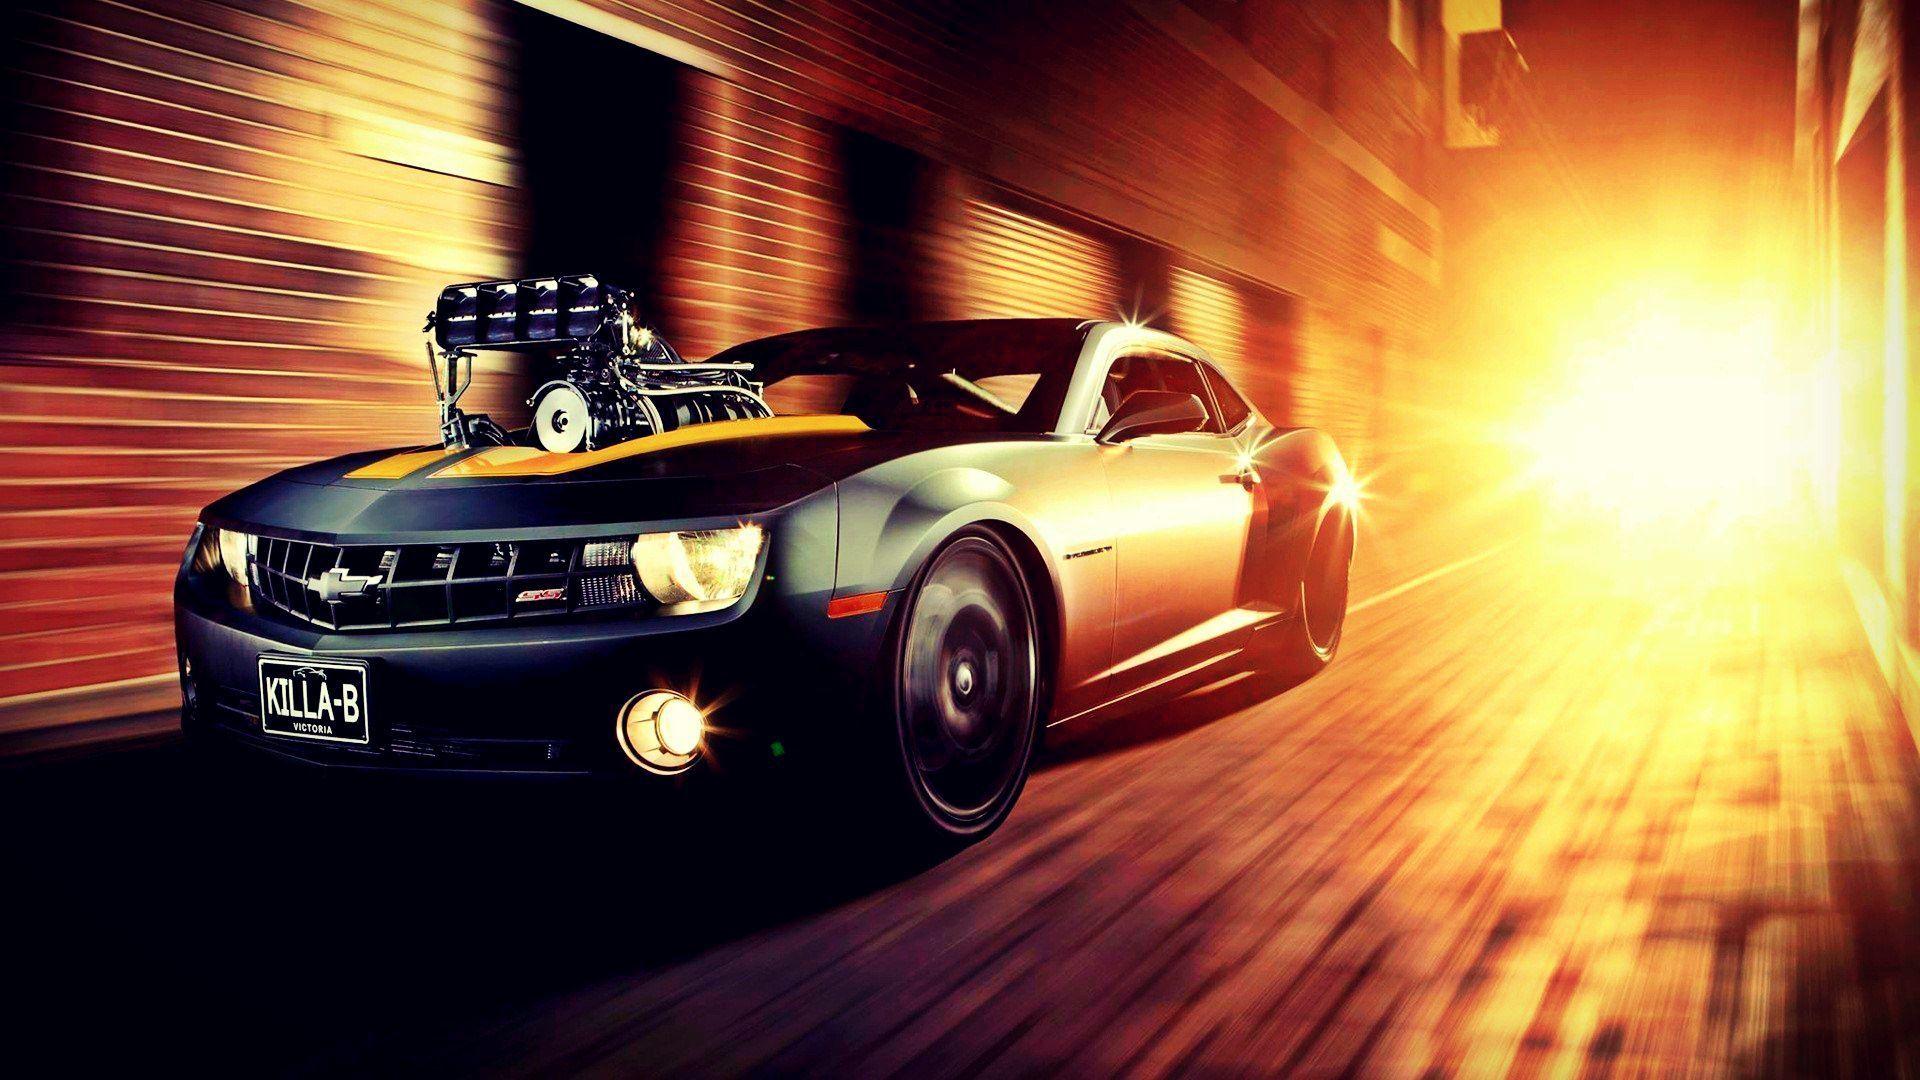 Camaro Car Hd Wallpapers For Mobile Cool Full Hd Images Free Download Pixelstalk Net